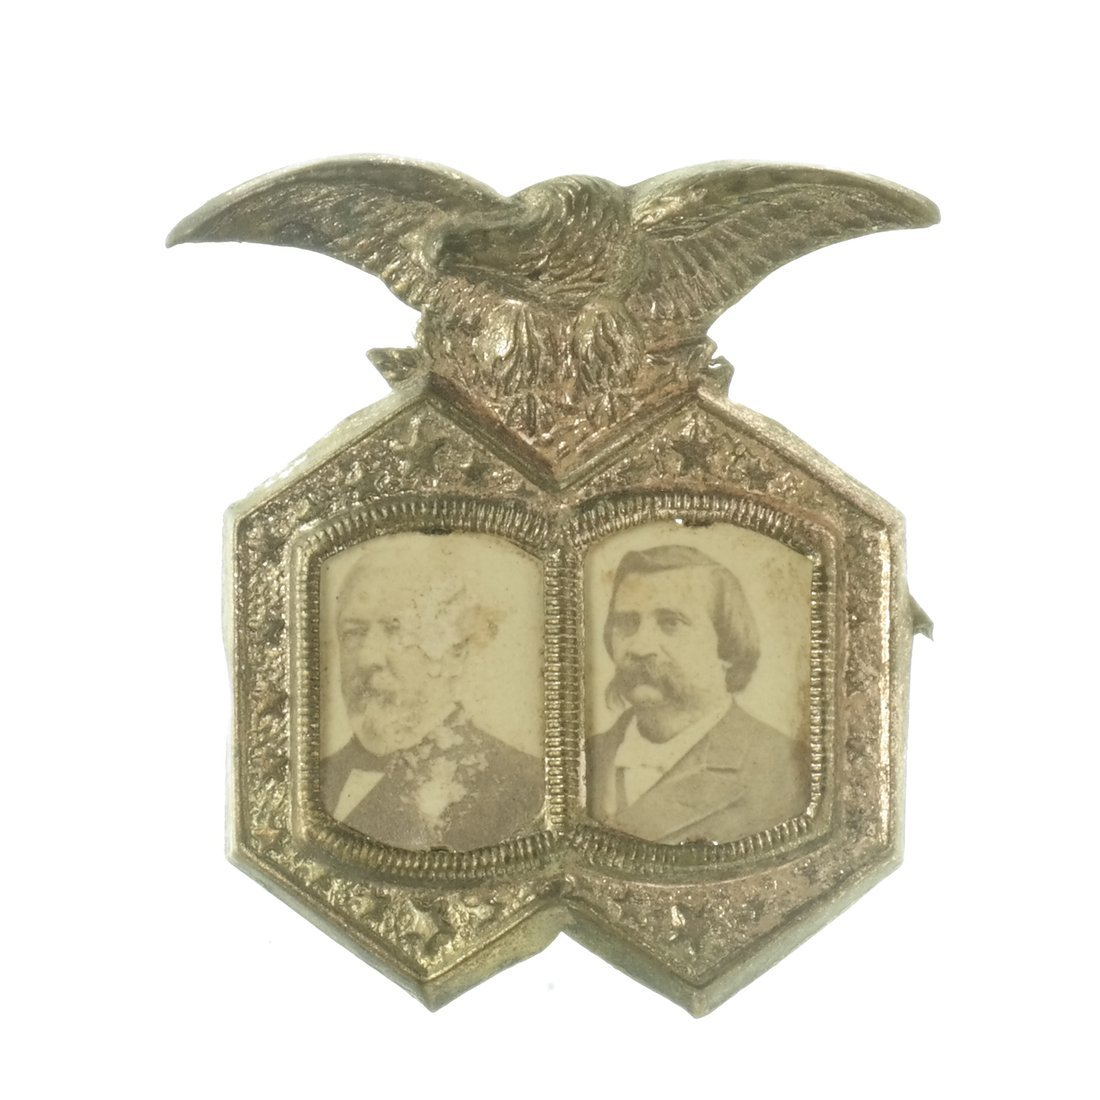 Blaine & Logan Two 1884 Jugate Shell Badges - 4